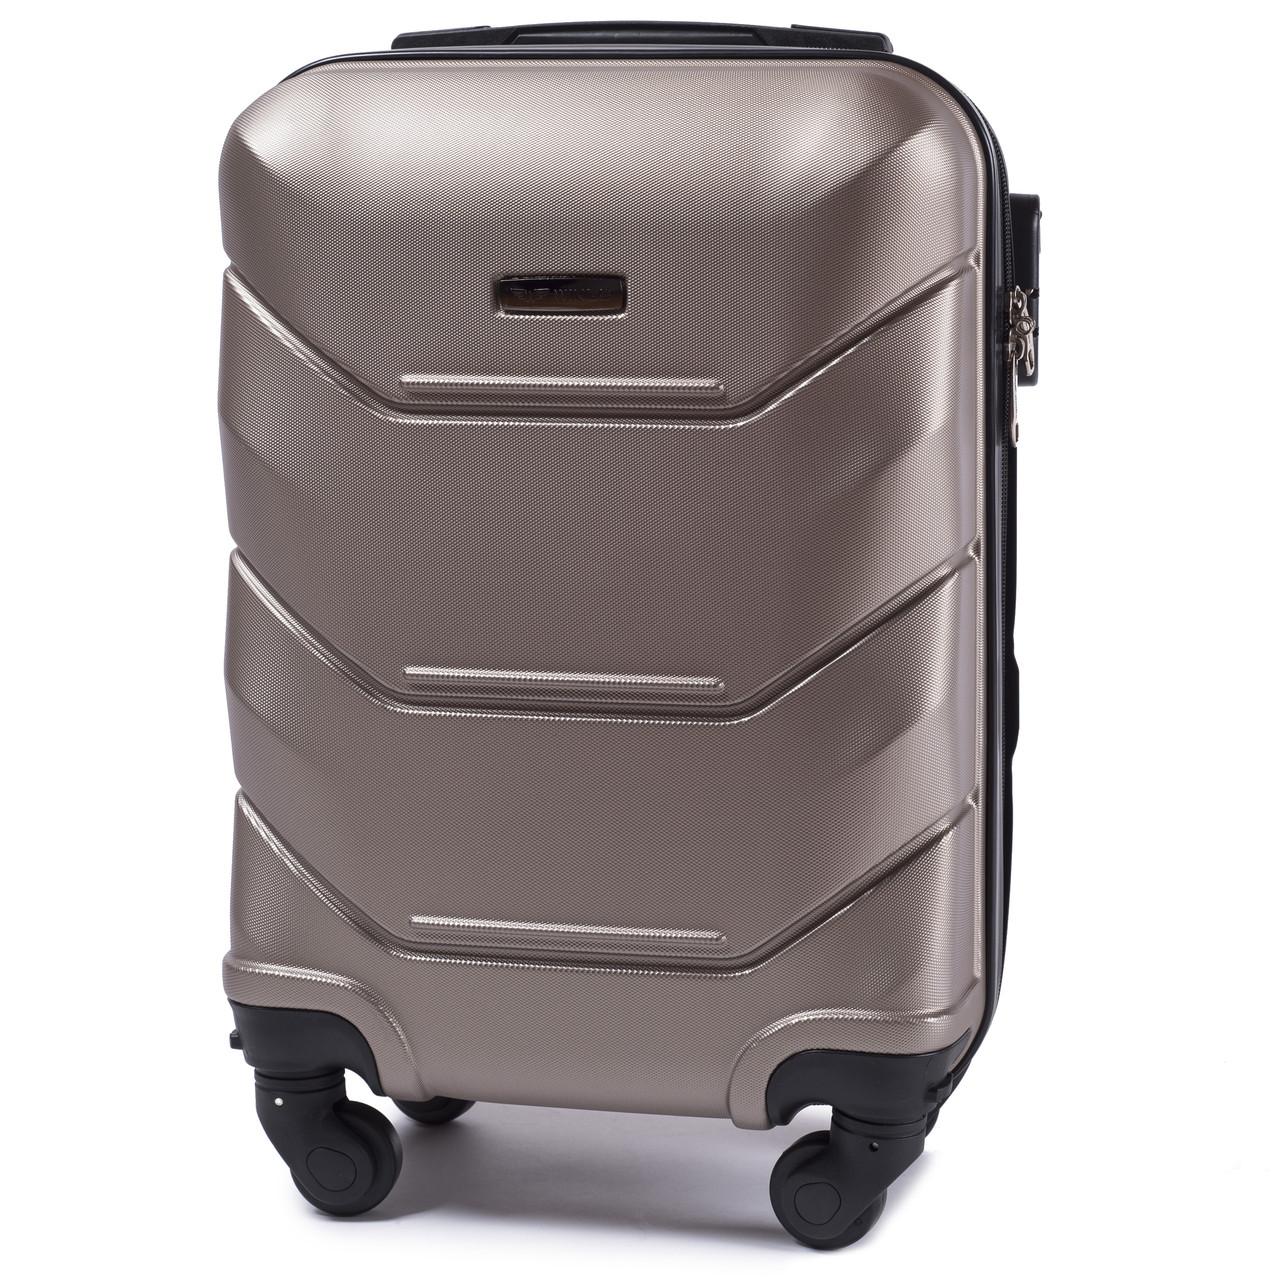 7909fb05fe6b Чемодан пластик мини фирмы WINGS на 4-х колесах (ручная кладь) - MyBag